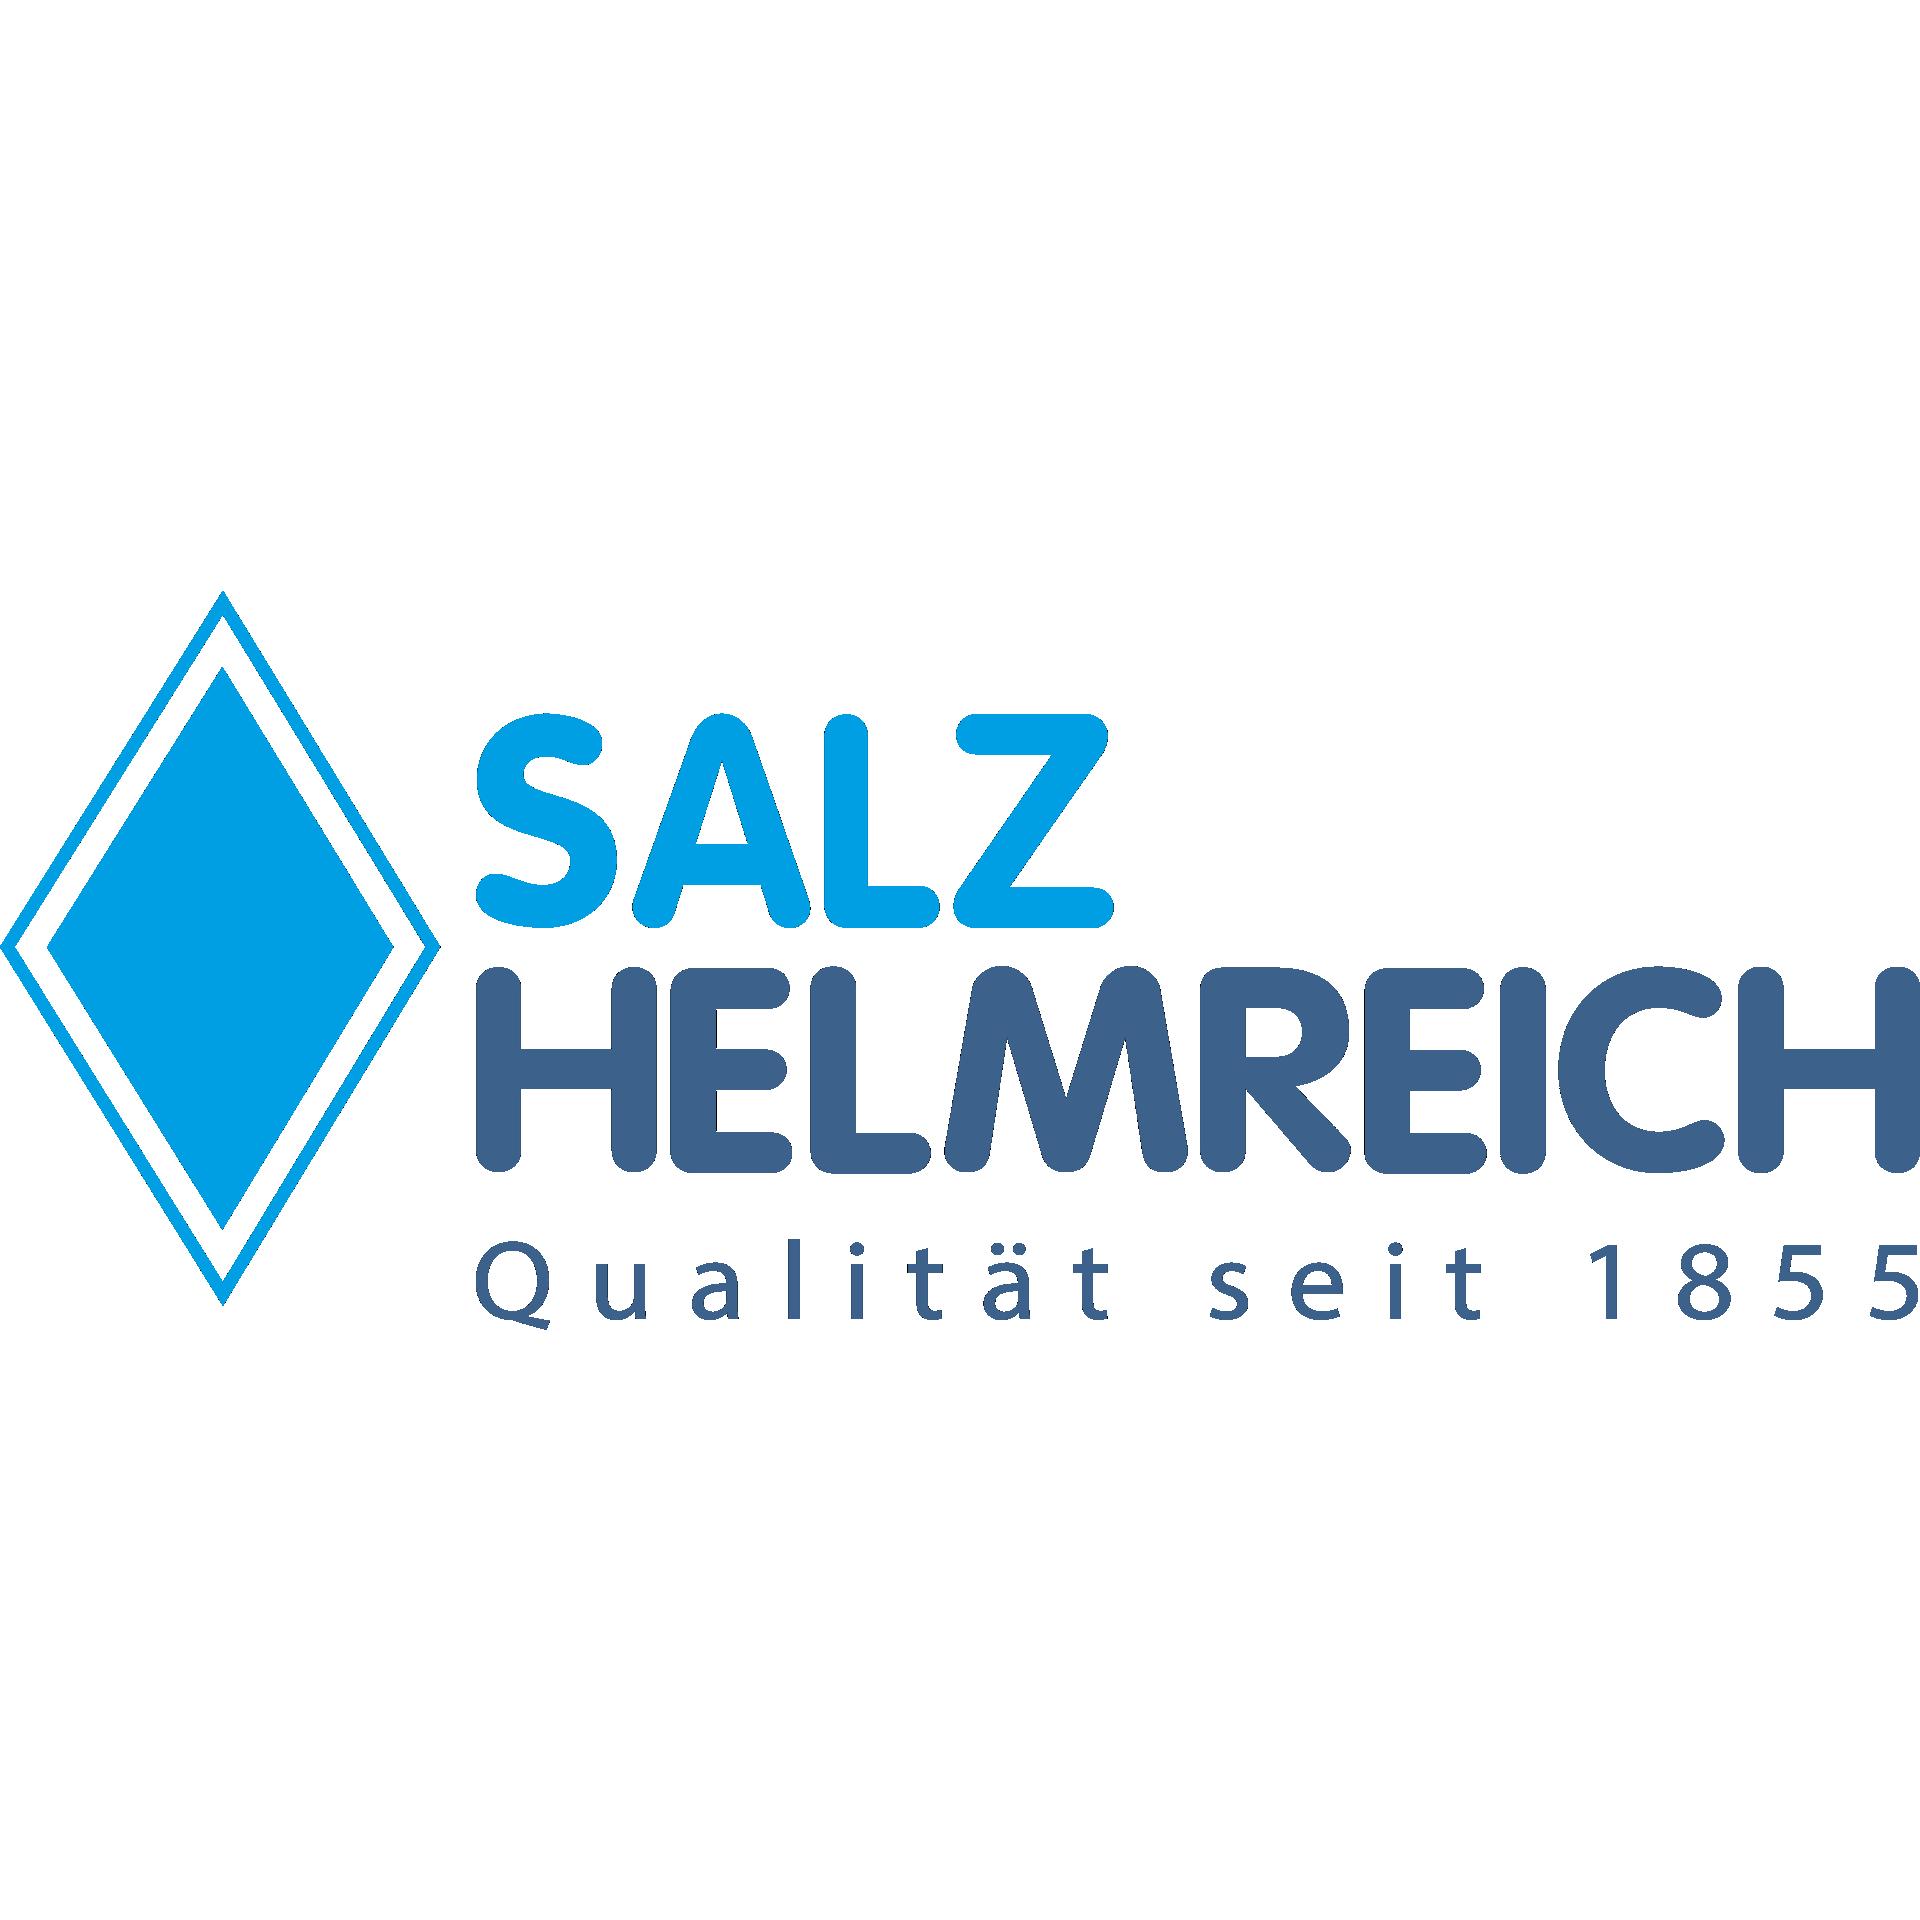 Calciumchlorid Dihydrat, E 509, Ph. Eur., USP im 25 kg Sack